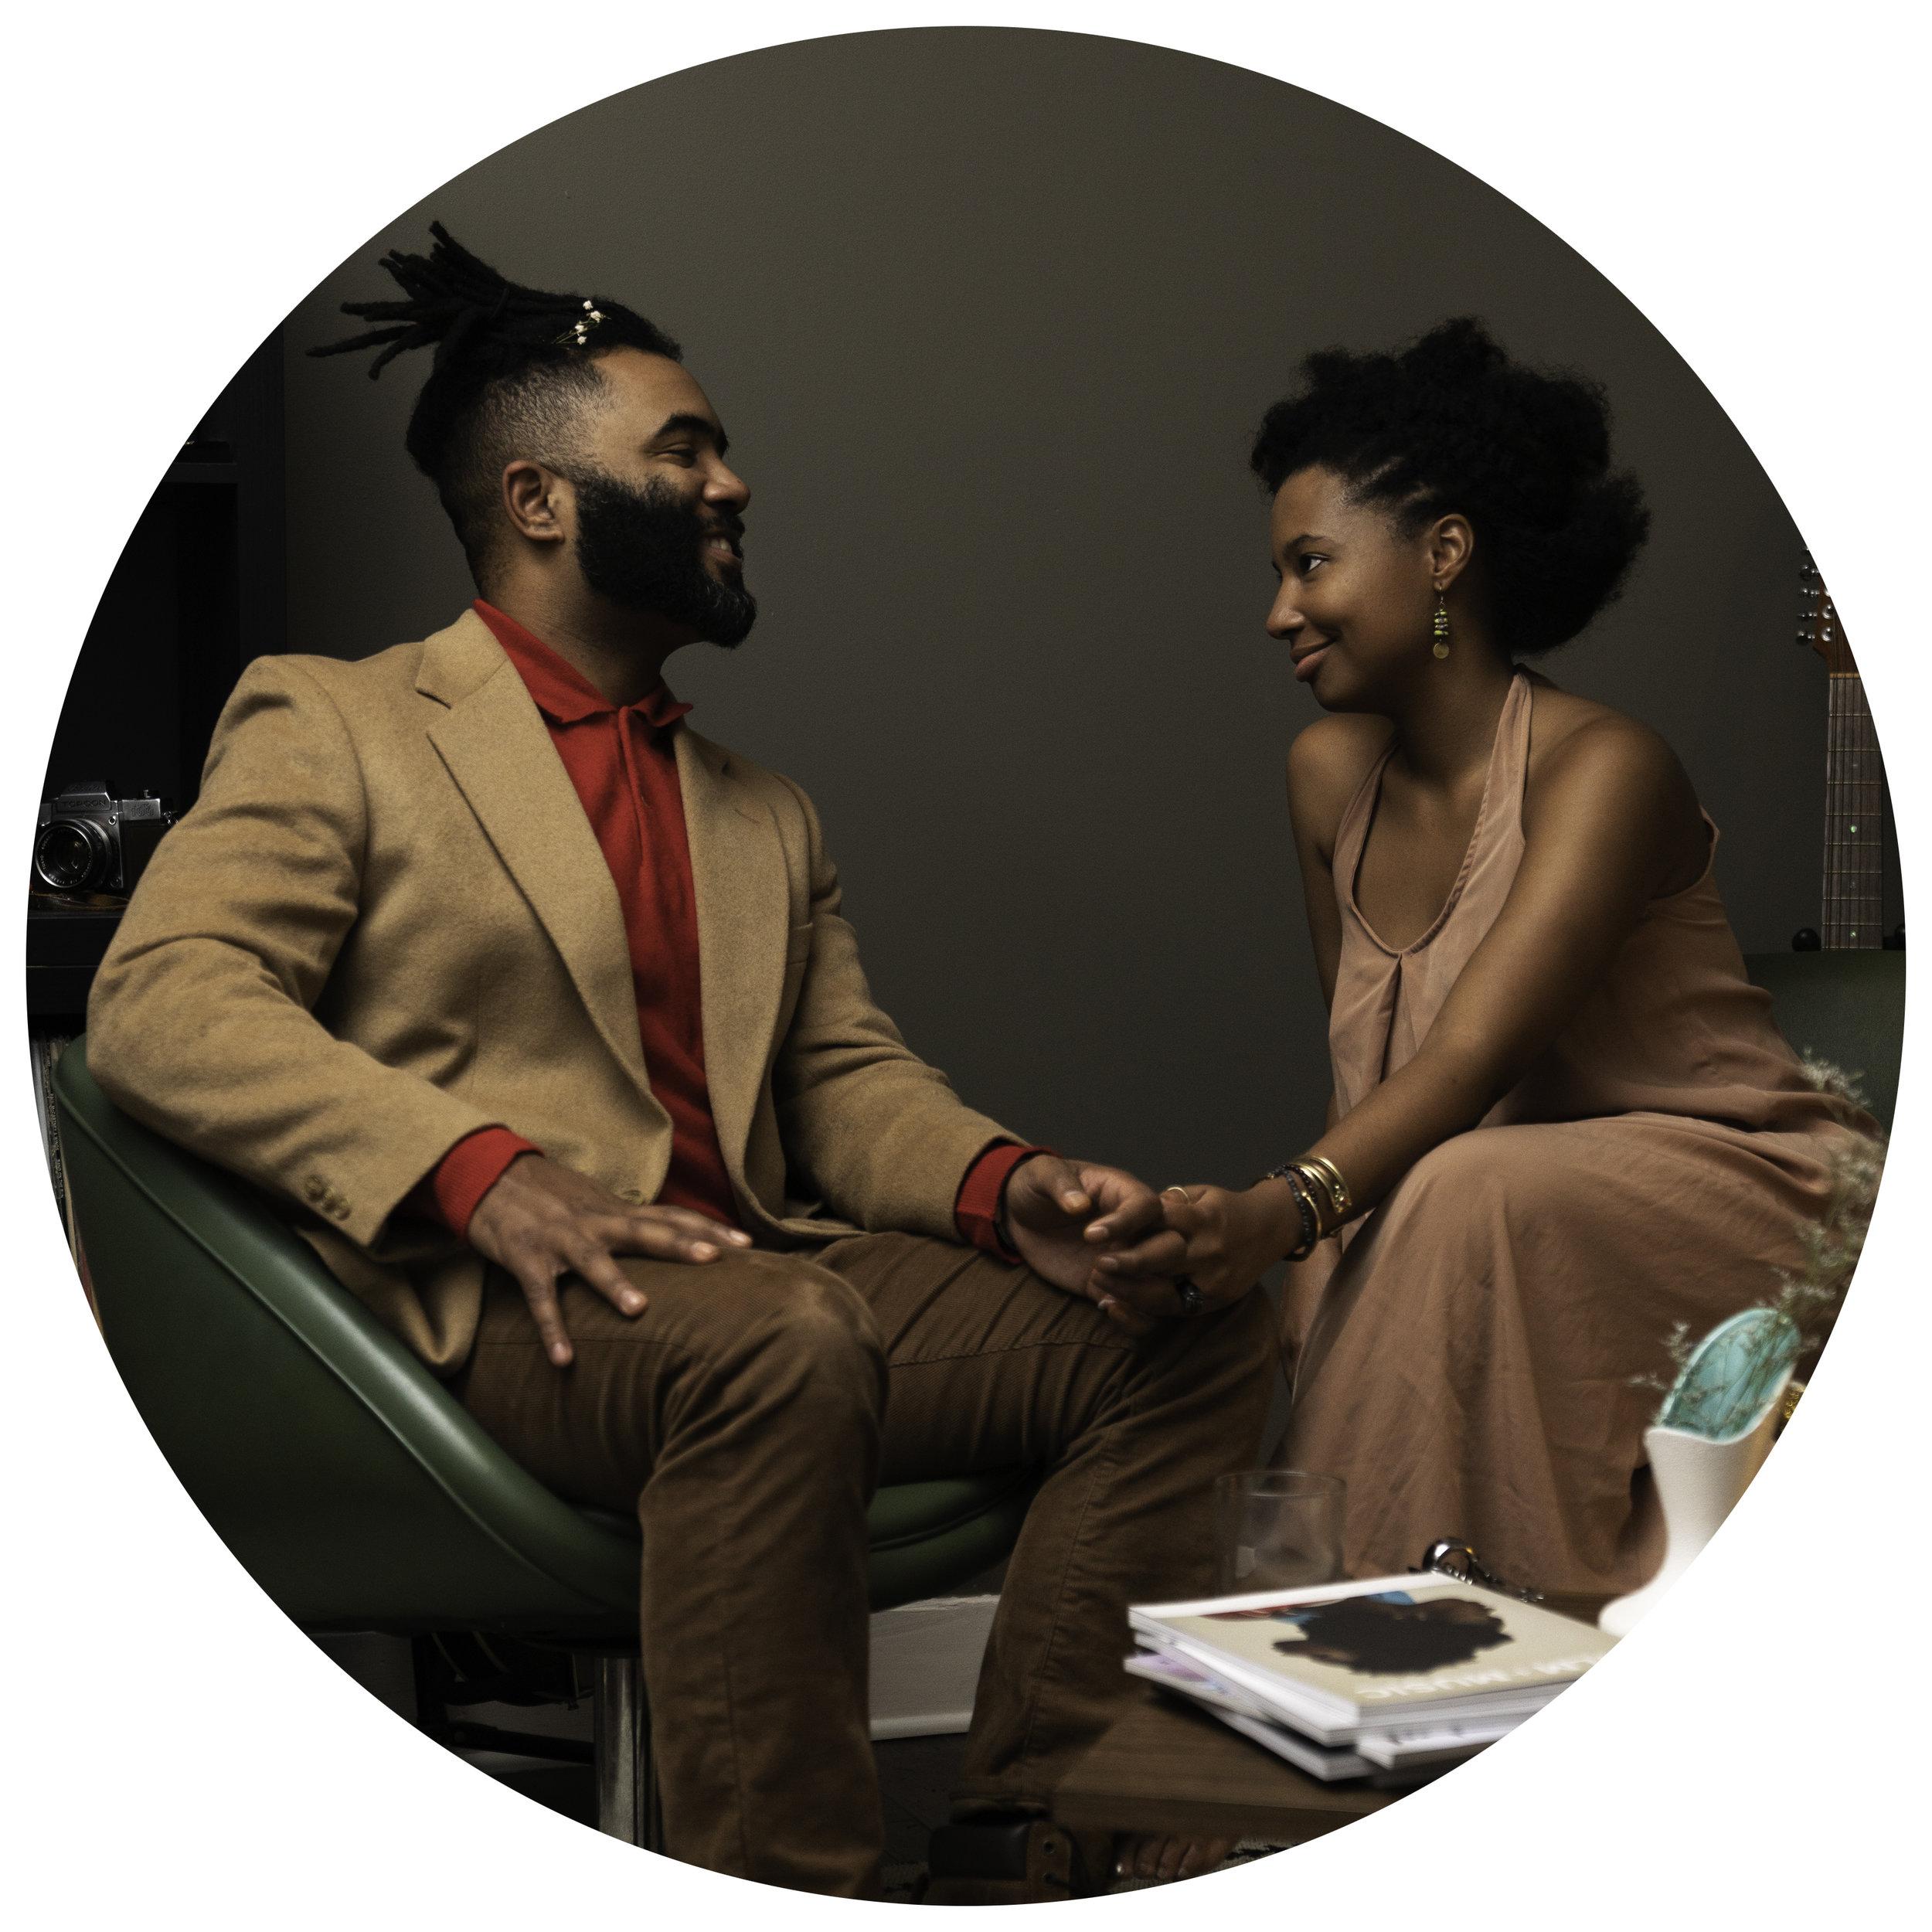 couple-circle-3.jpg